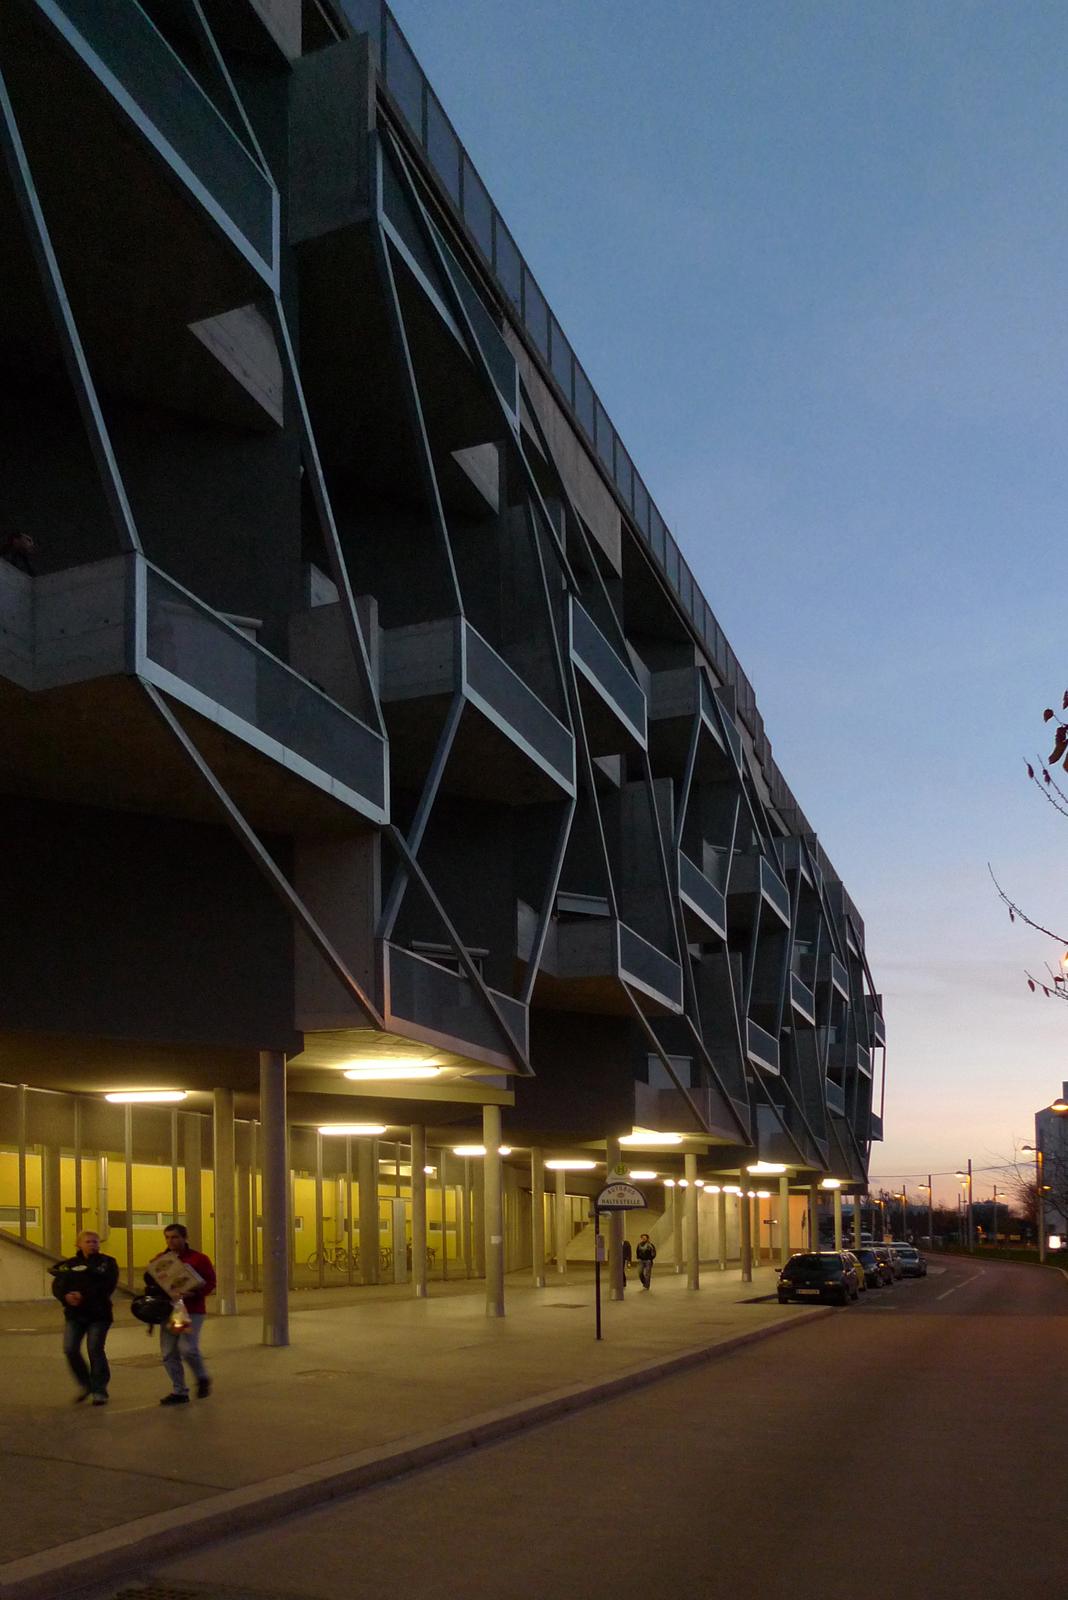 Terrace House Tokiostrasse by ARTEC Architekten - Architizer